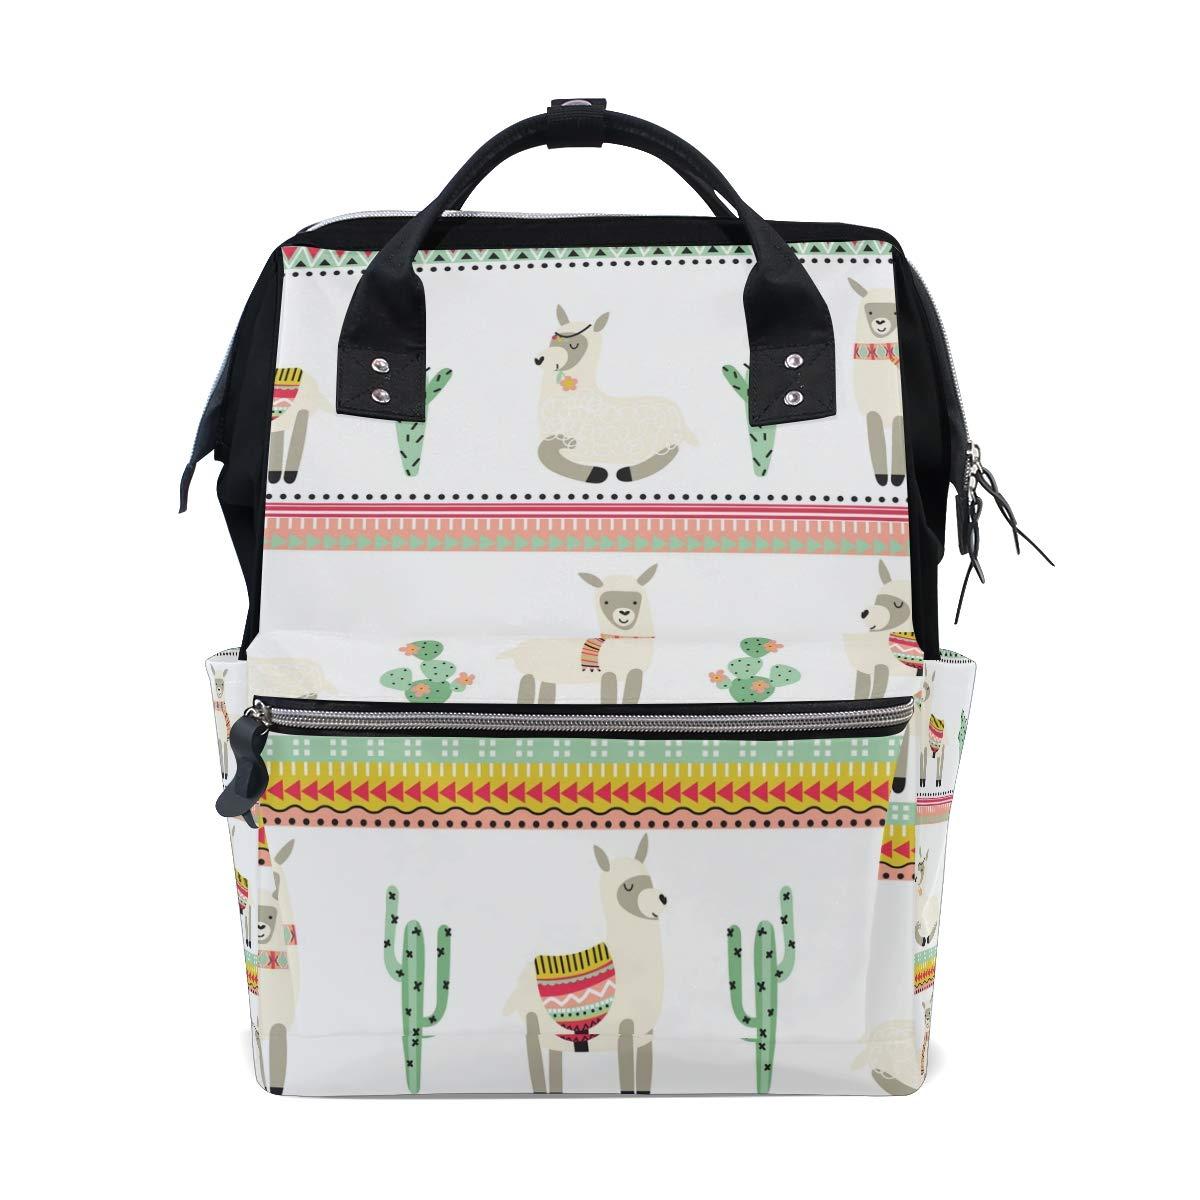 MERRYSUGAR Diaper Bag Backpack Cute Llama Alpaca White Baby Bag School Backpack Mommy Bag Large Multifunction Travel Bag